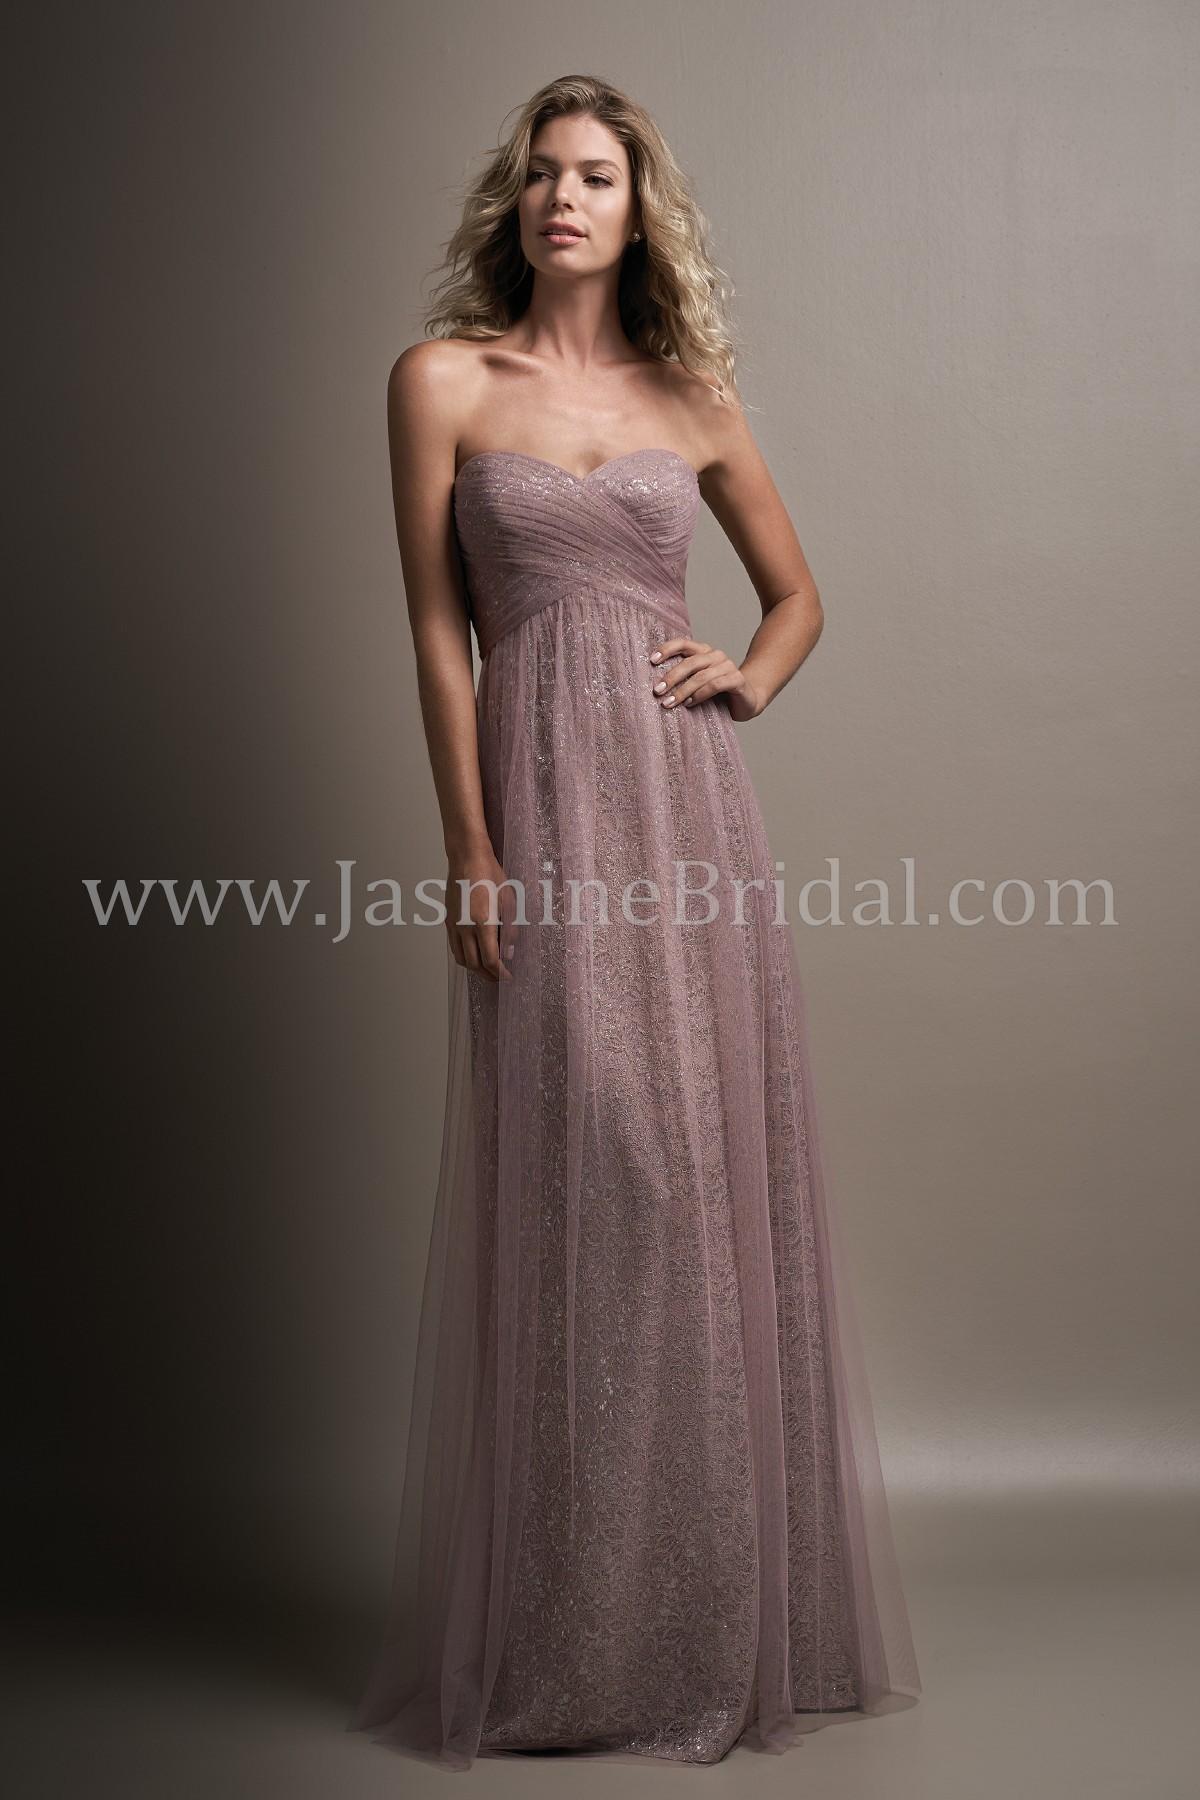 Jasmine bridal designer wedding dresses ombrellifo Images